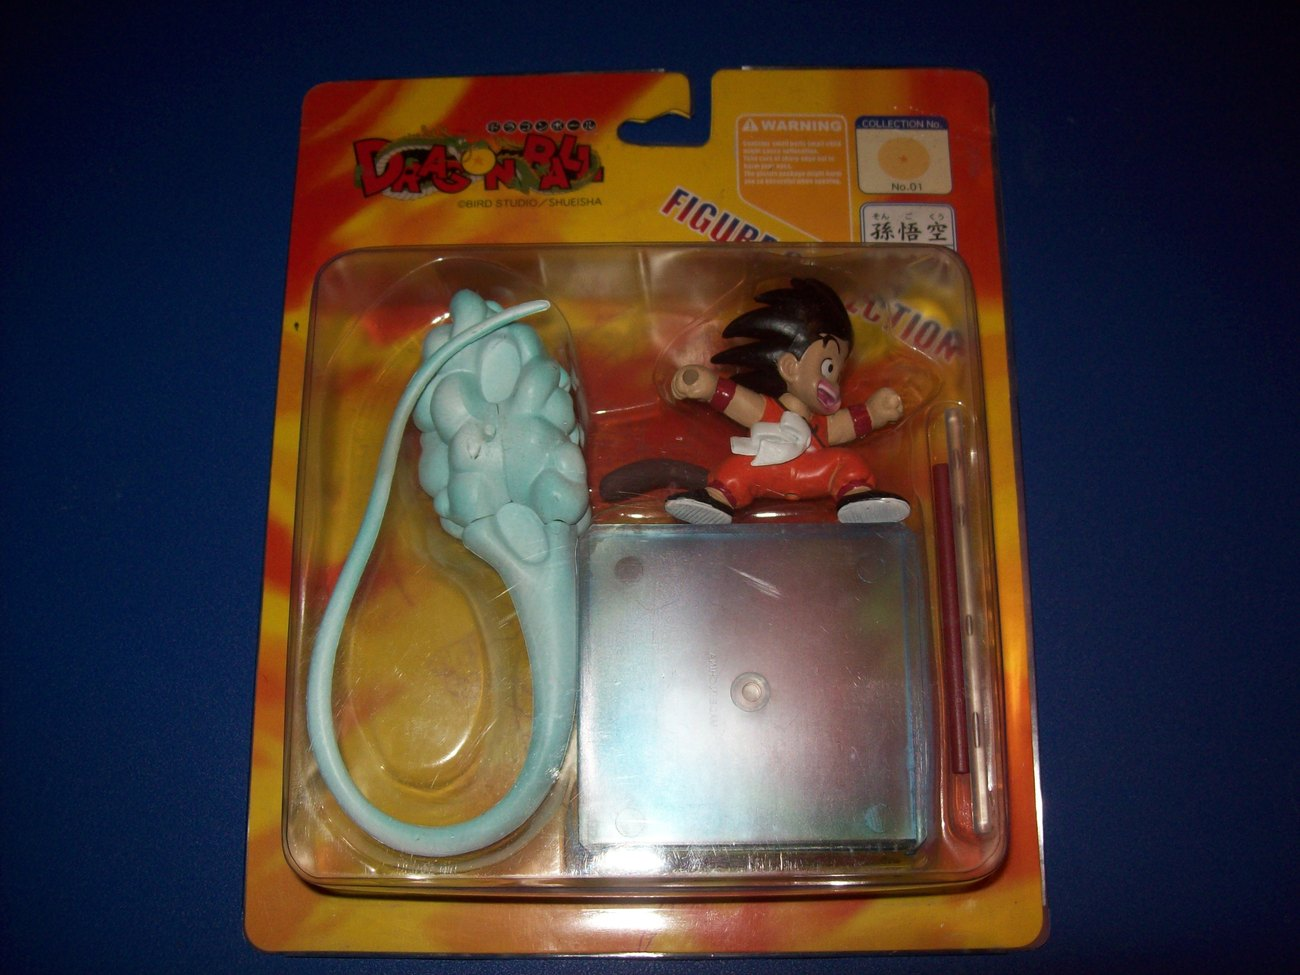 FREE SHIP dragonball z goku with flying nimbus dragonball figure toy